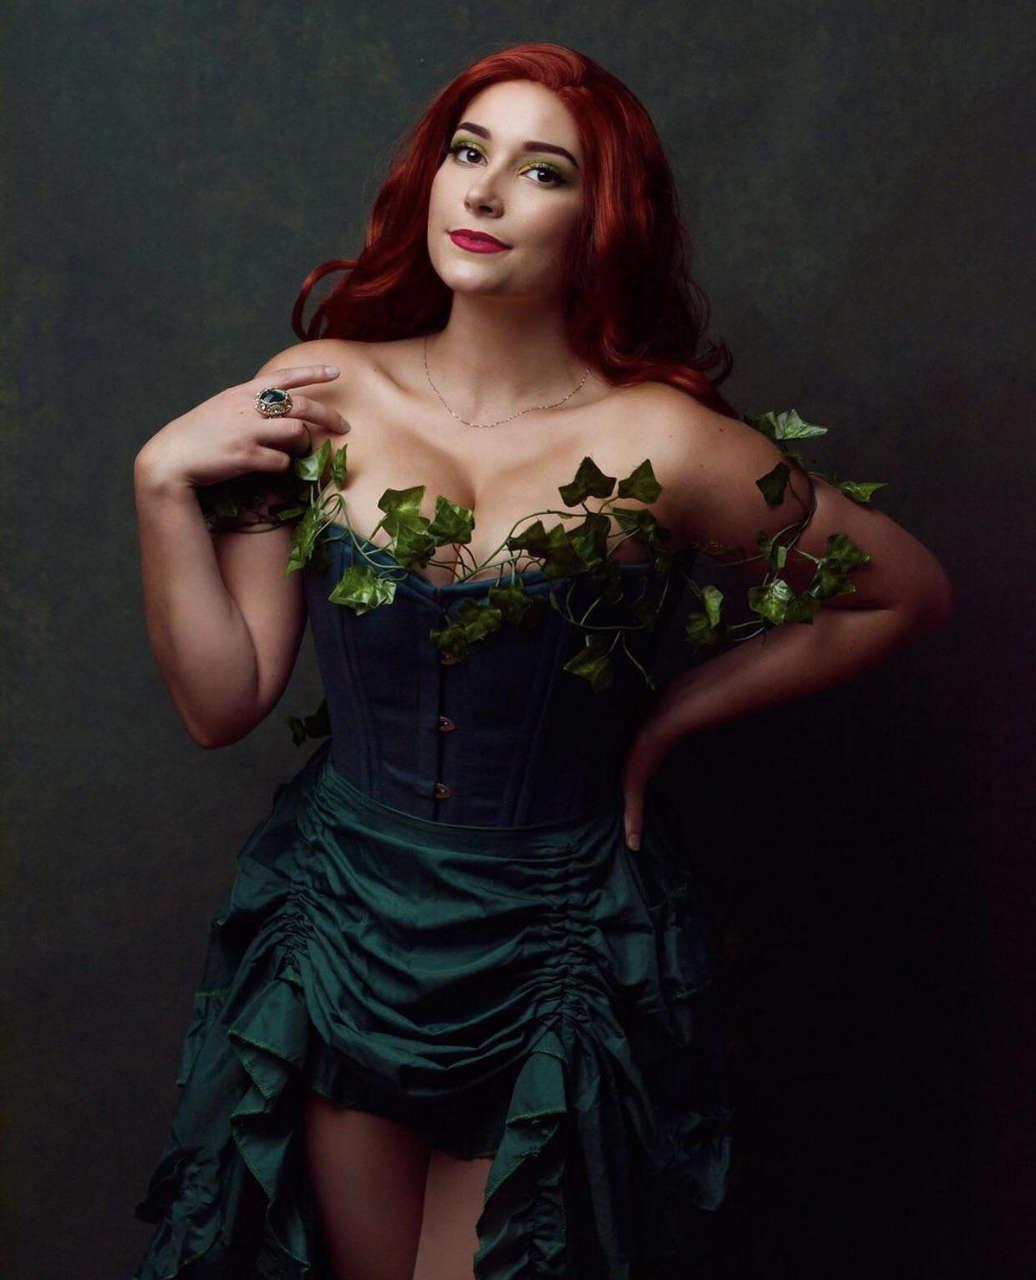 Poison Ivy By Moriah Lynne - cosplaygirls.net